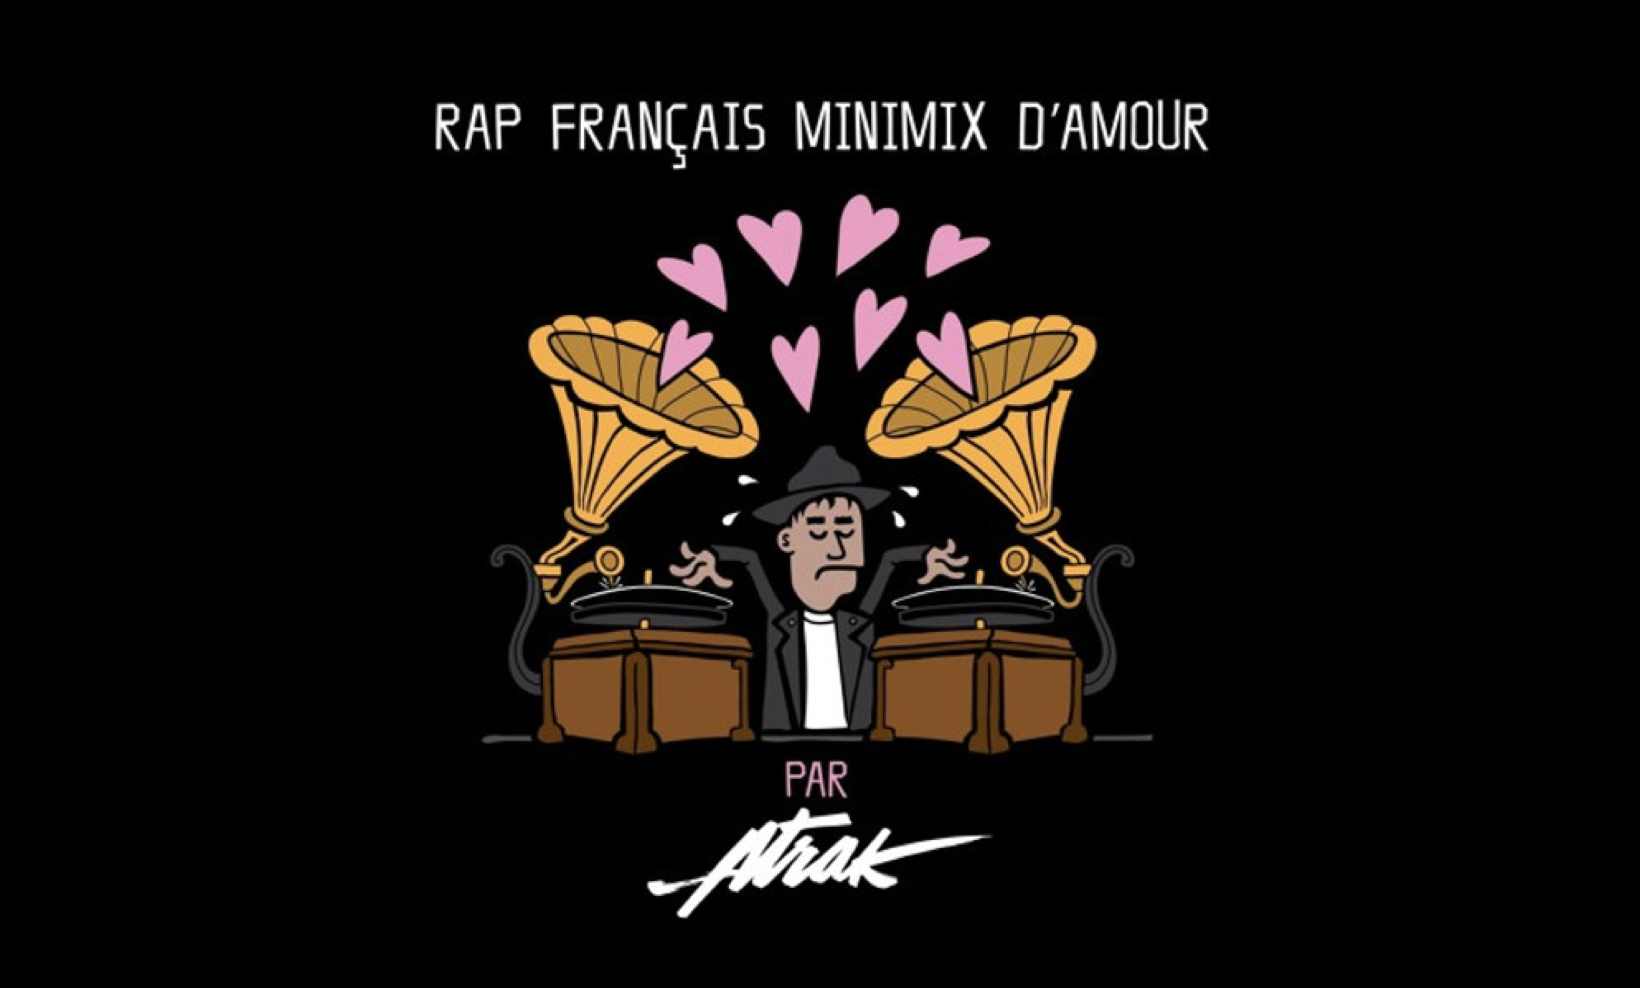 Minimix : quand A Trak partage du rap français avec Pharrell